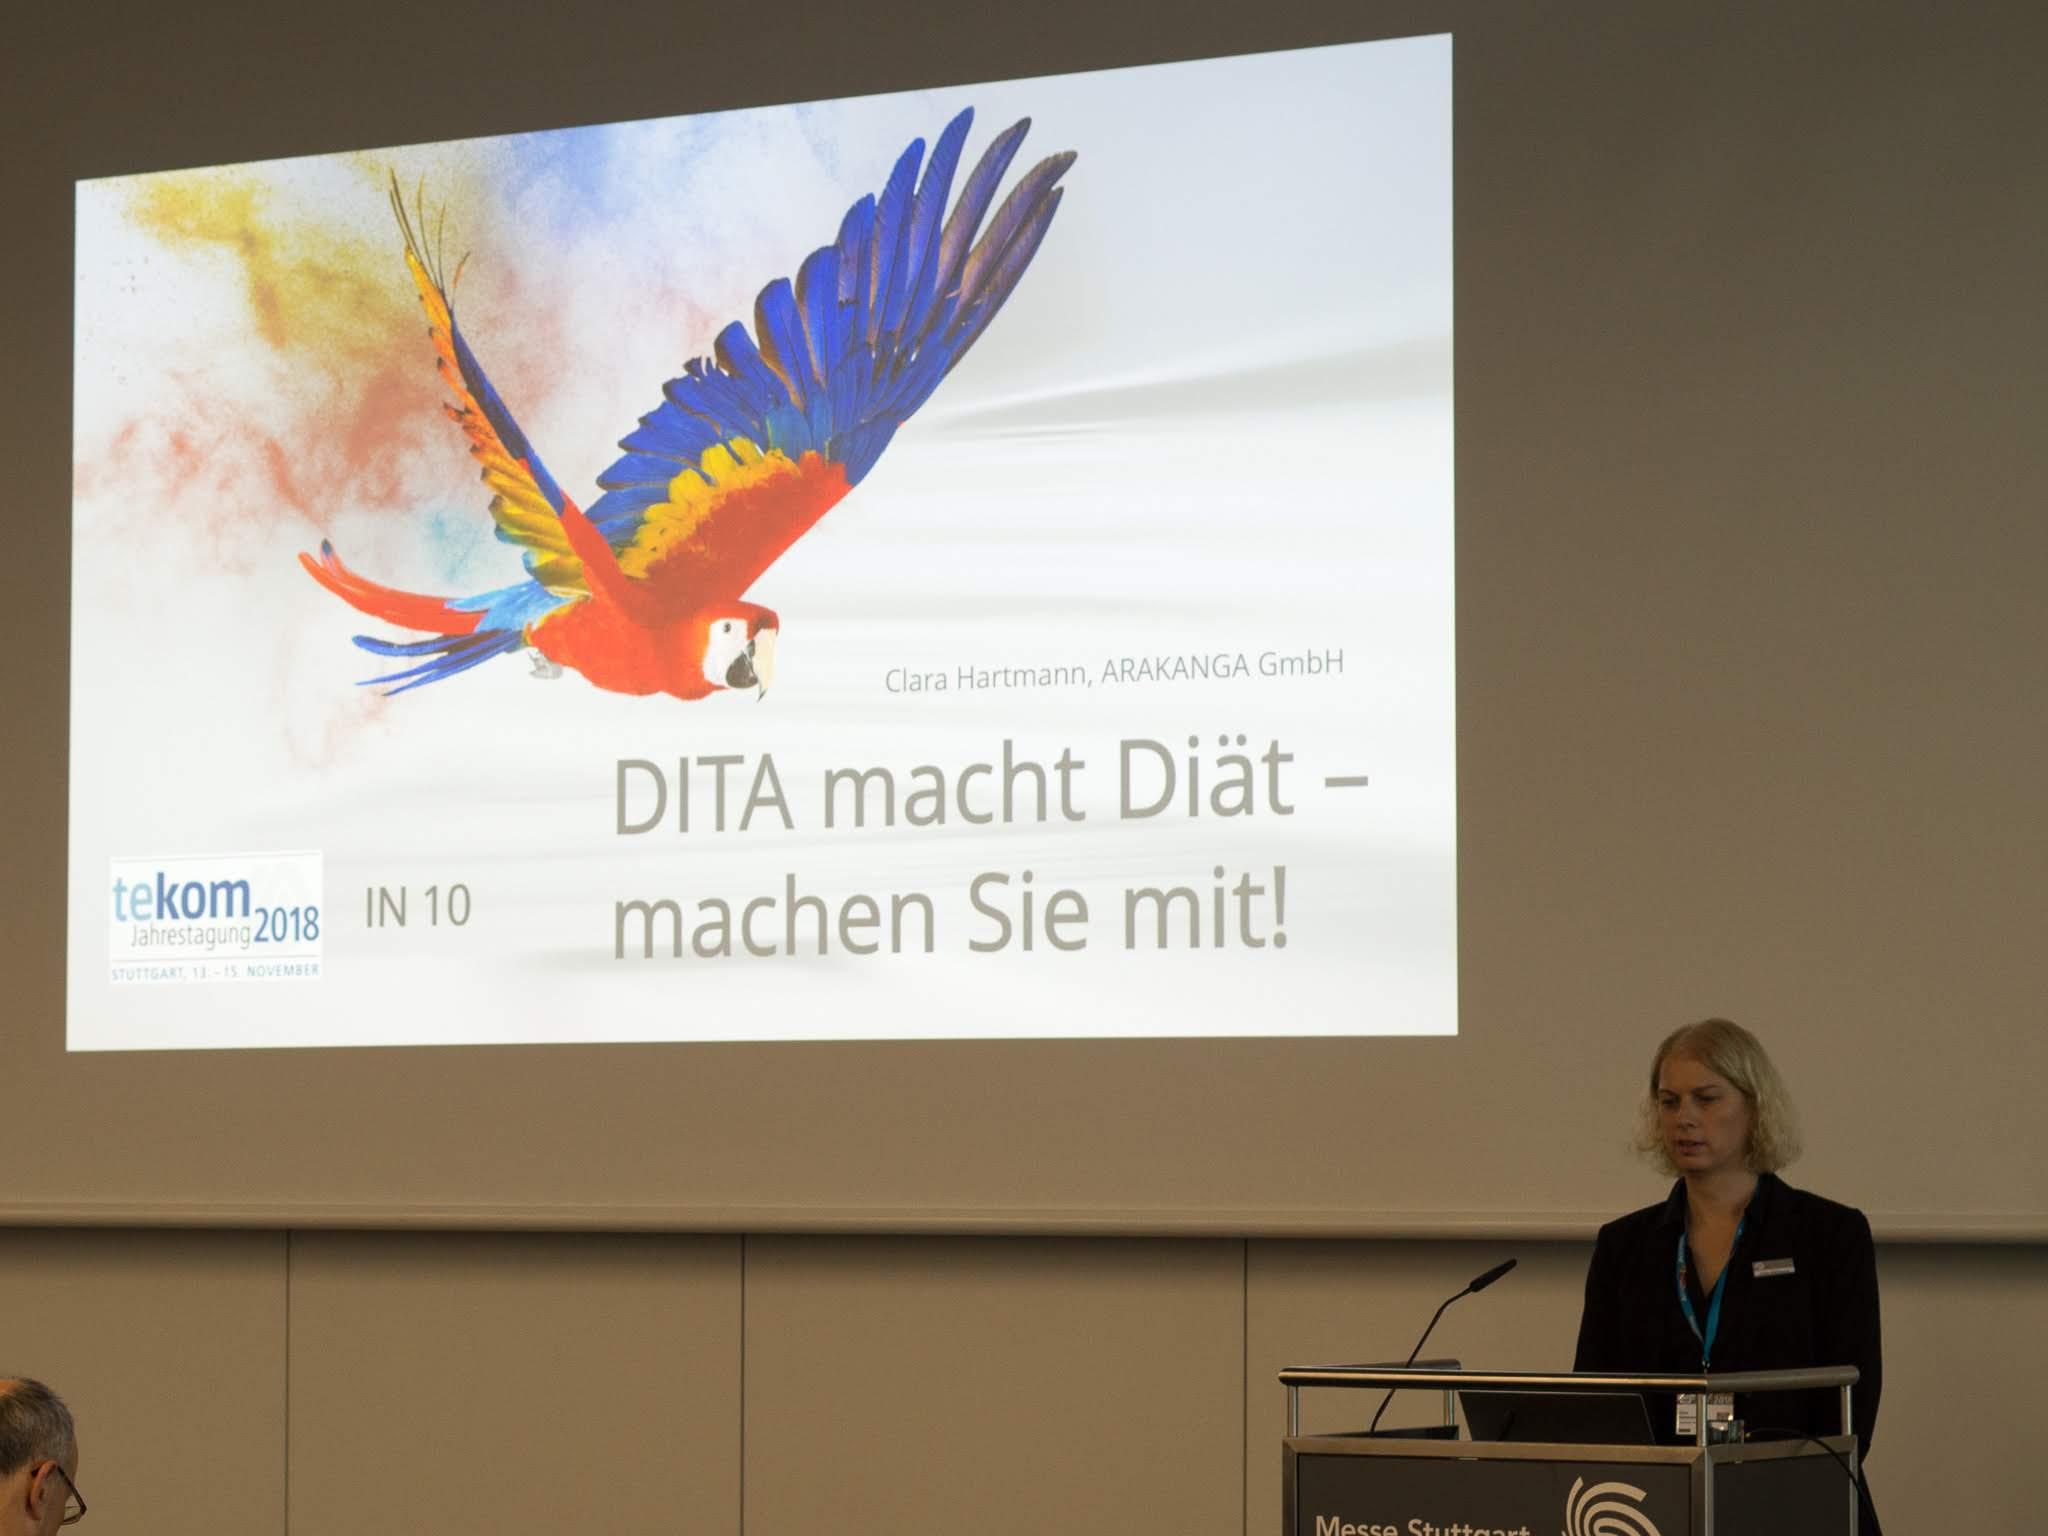 Foto aus dem Vortrag: DITA macht Diät